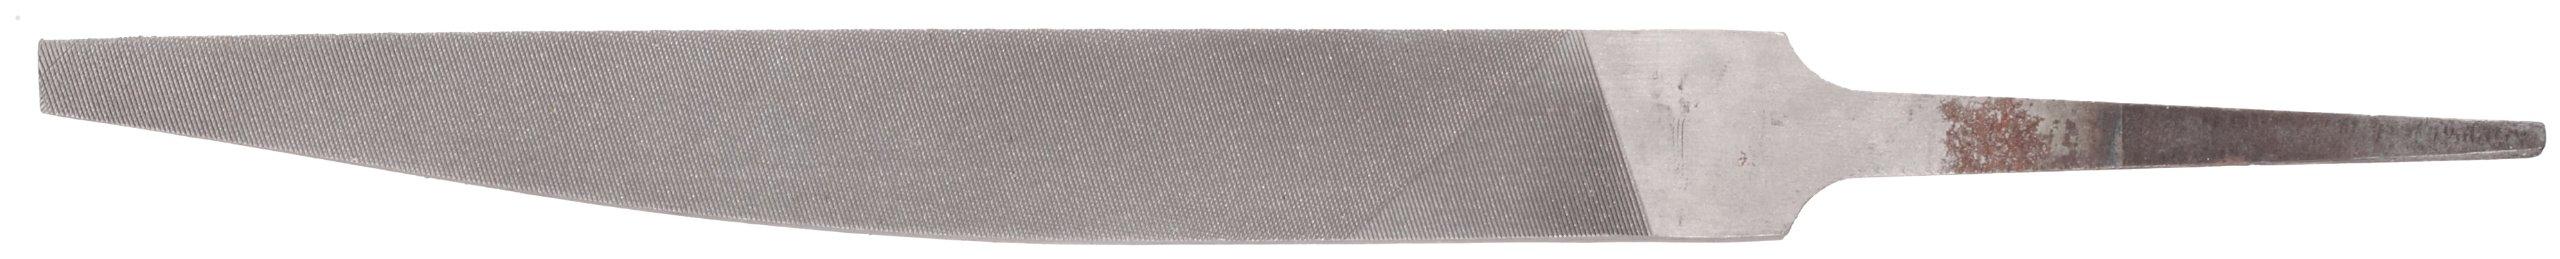 Nicholson Hand File, American Pattern, Double Cut, Knife, Medium, 6'' Length